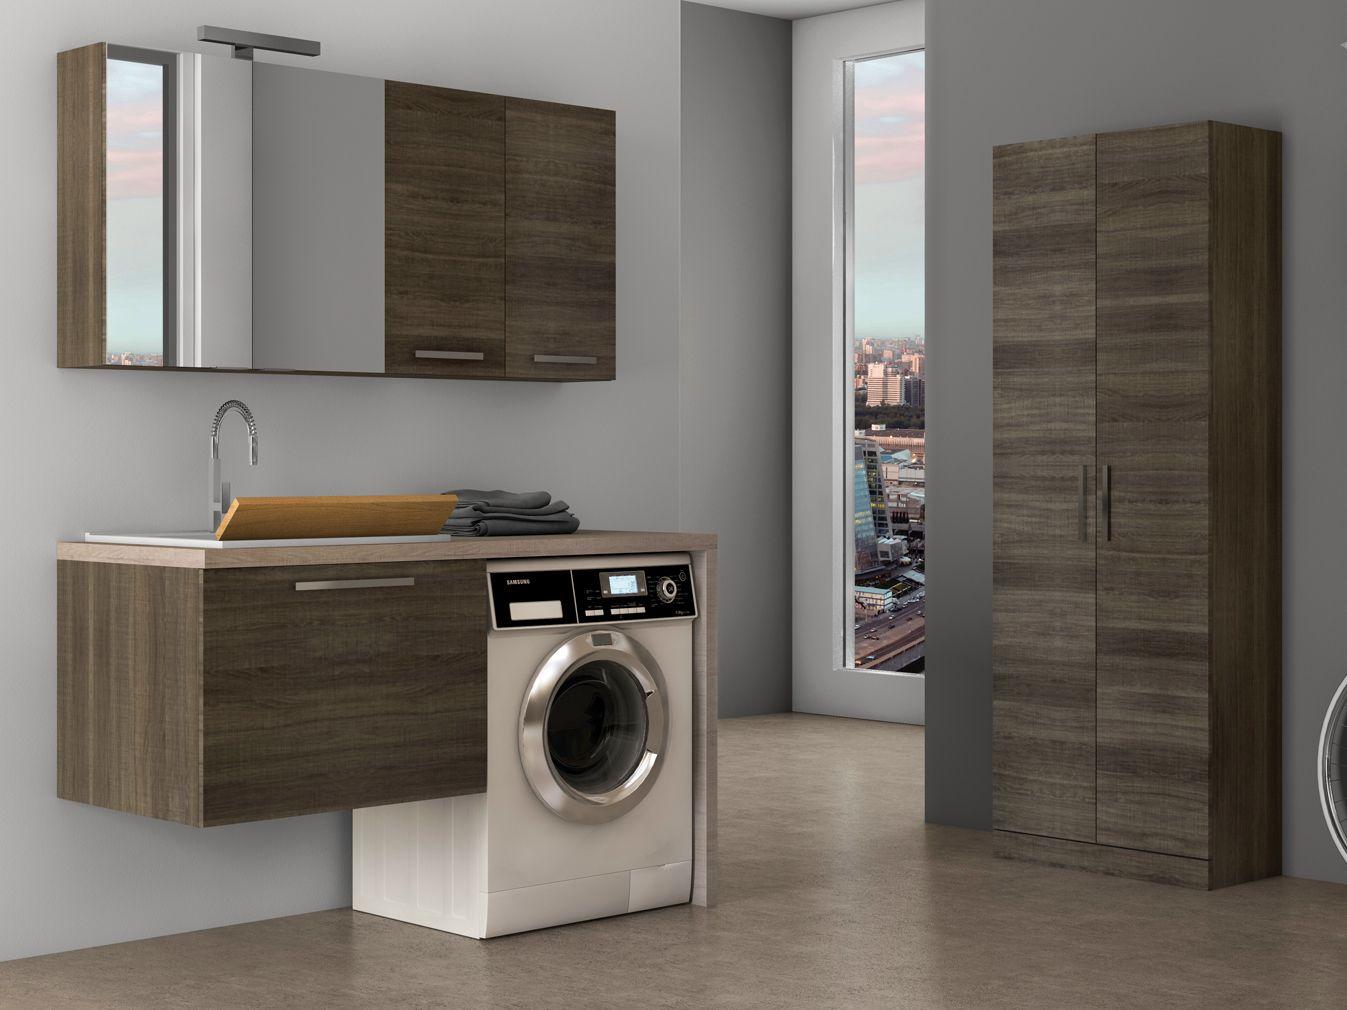 washing machine | baño | pinterest | baño, arquitectura y chicas